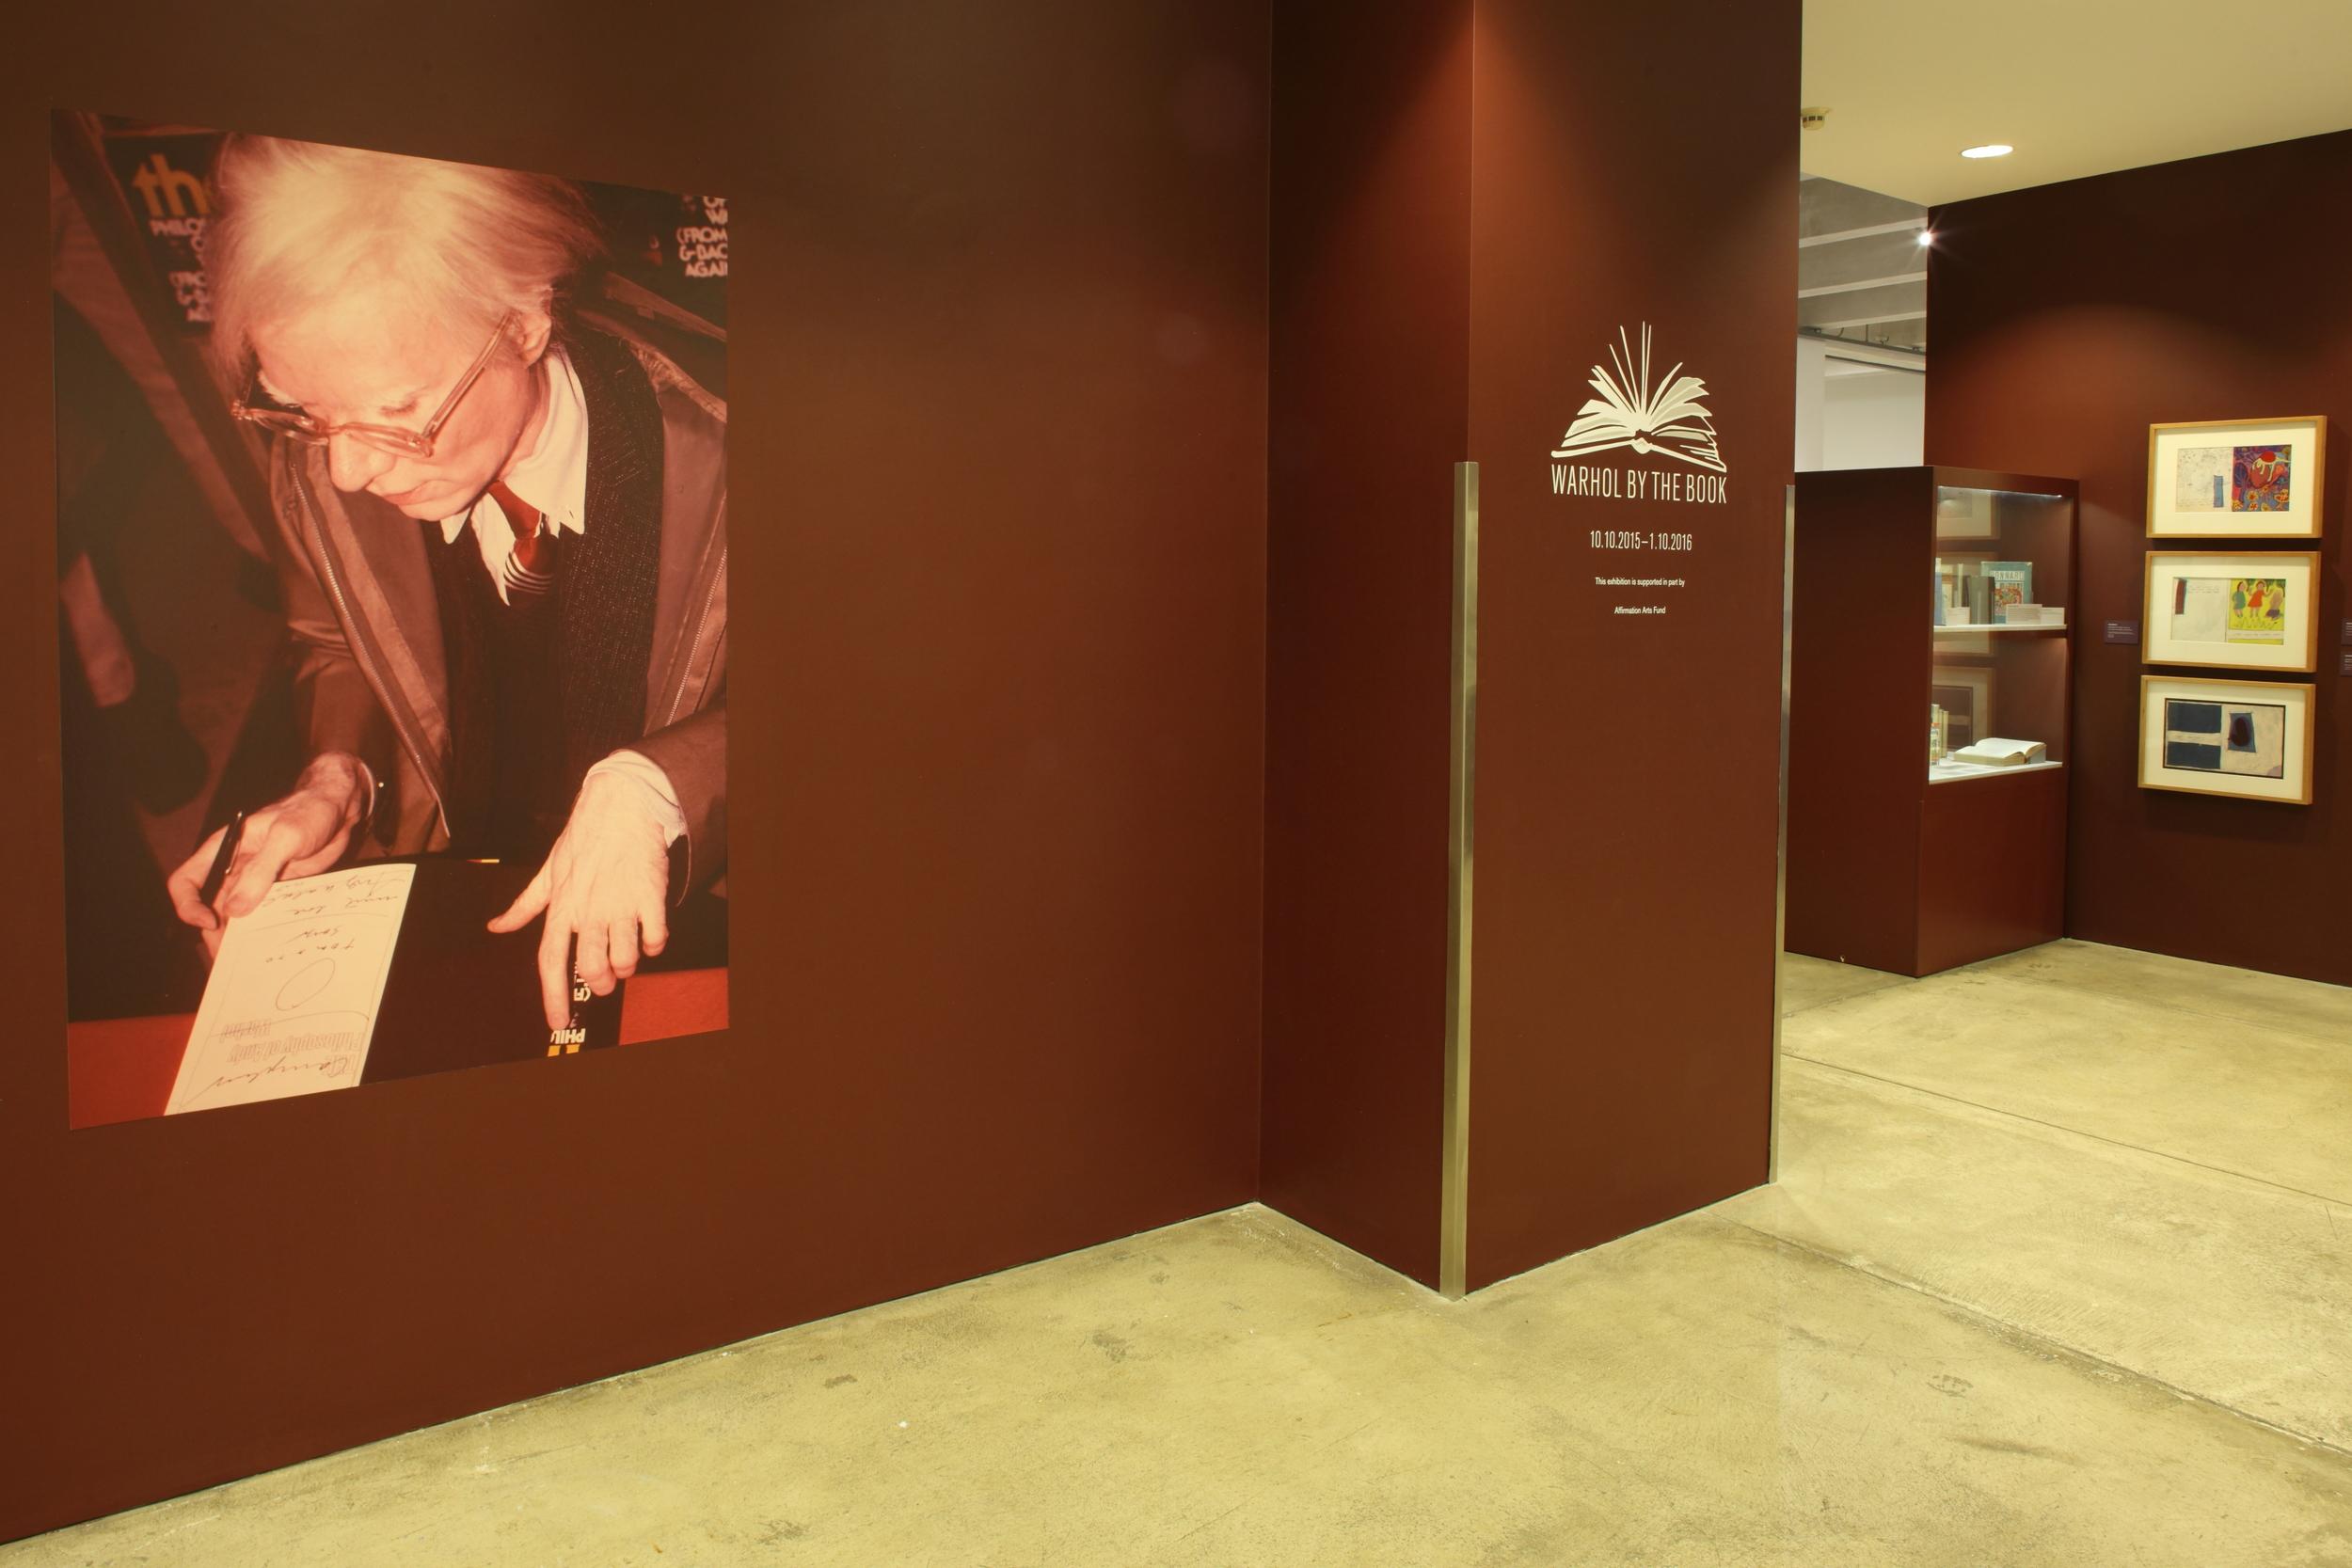 Warhol By the Book at AWM, 2015 0002.JPG